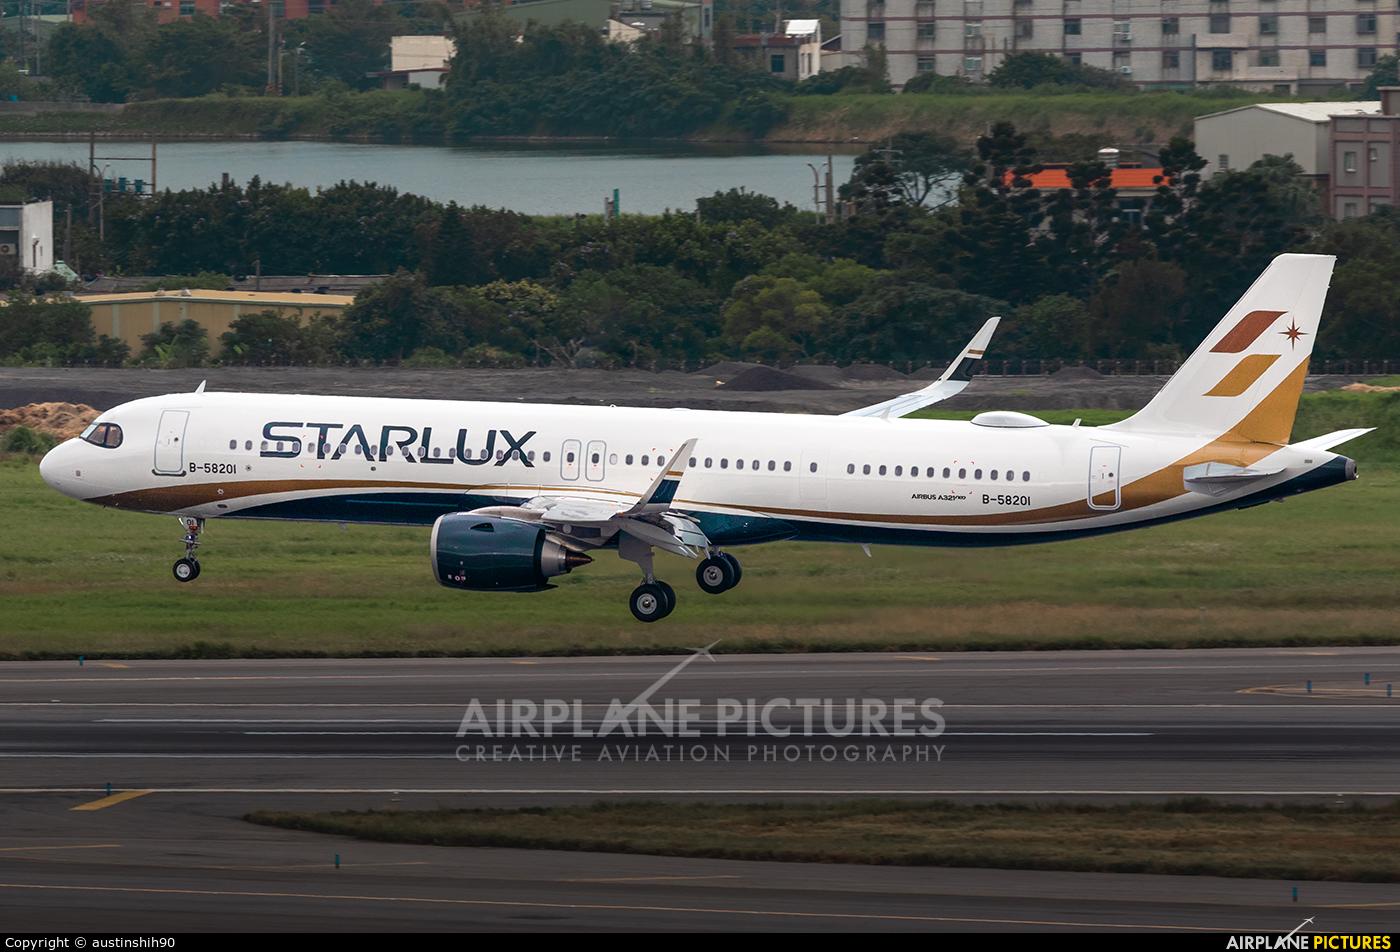 Starlux Airlines B-58201 aircraft at Taipei - Taoyuan Intl